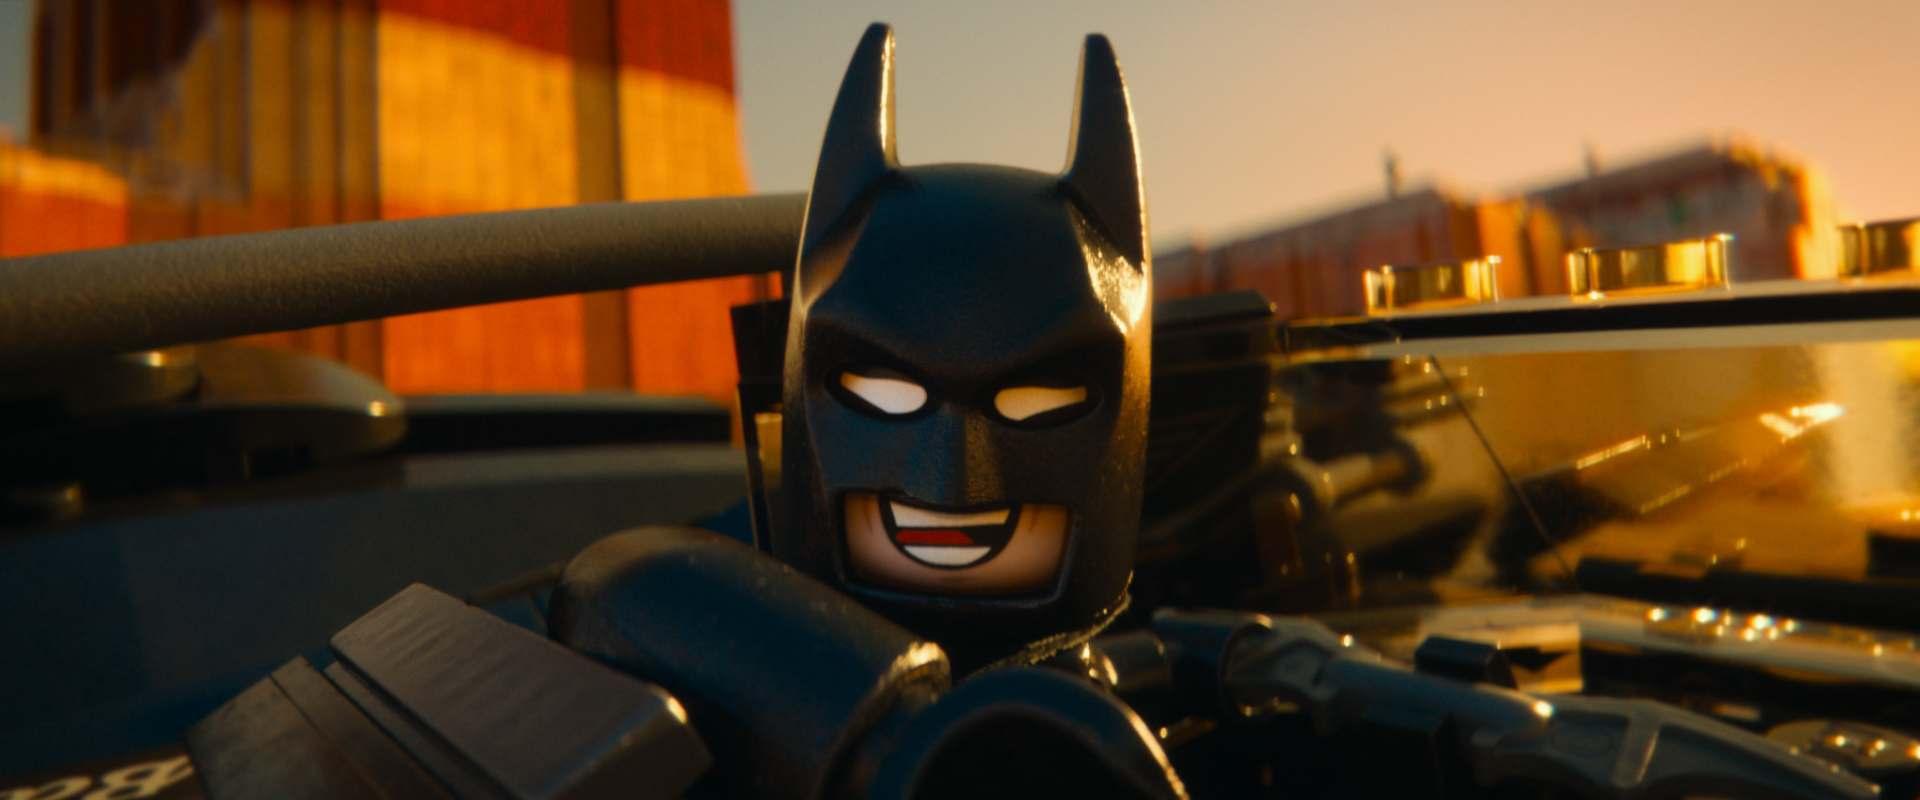 Watch The Lego Movie on Netflix Today! | NetflixMovies.com